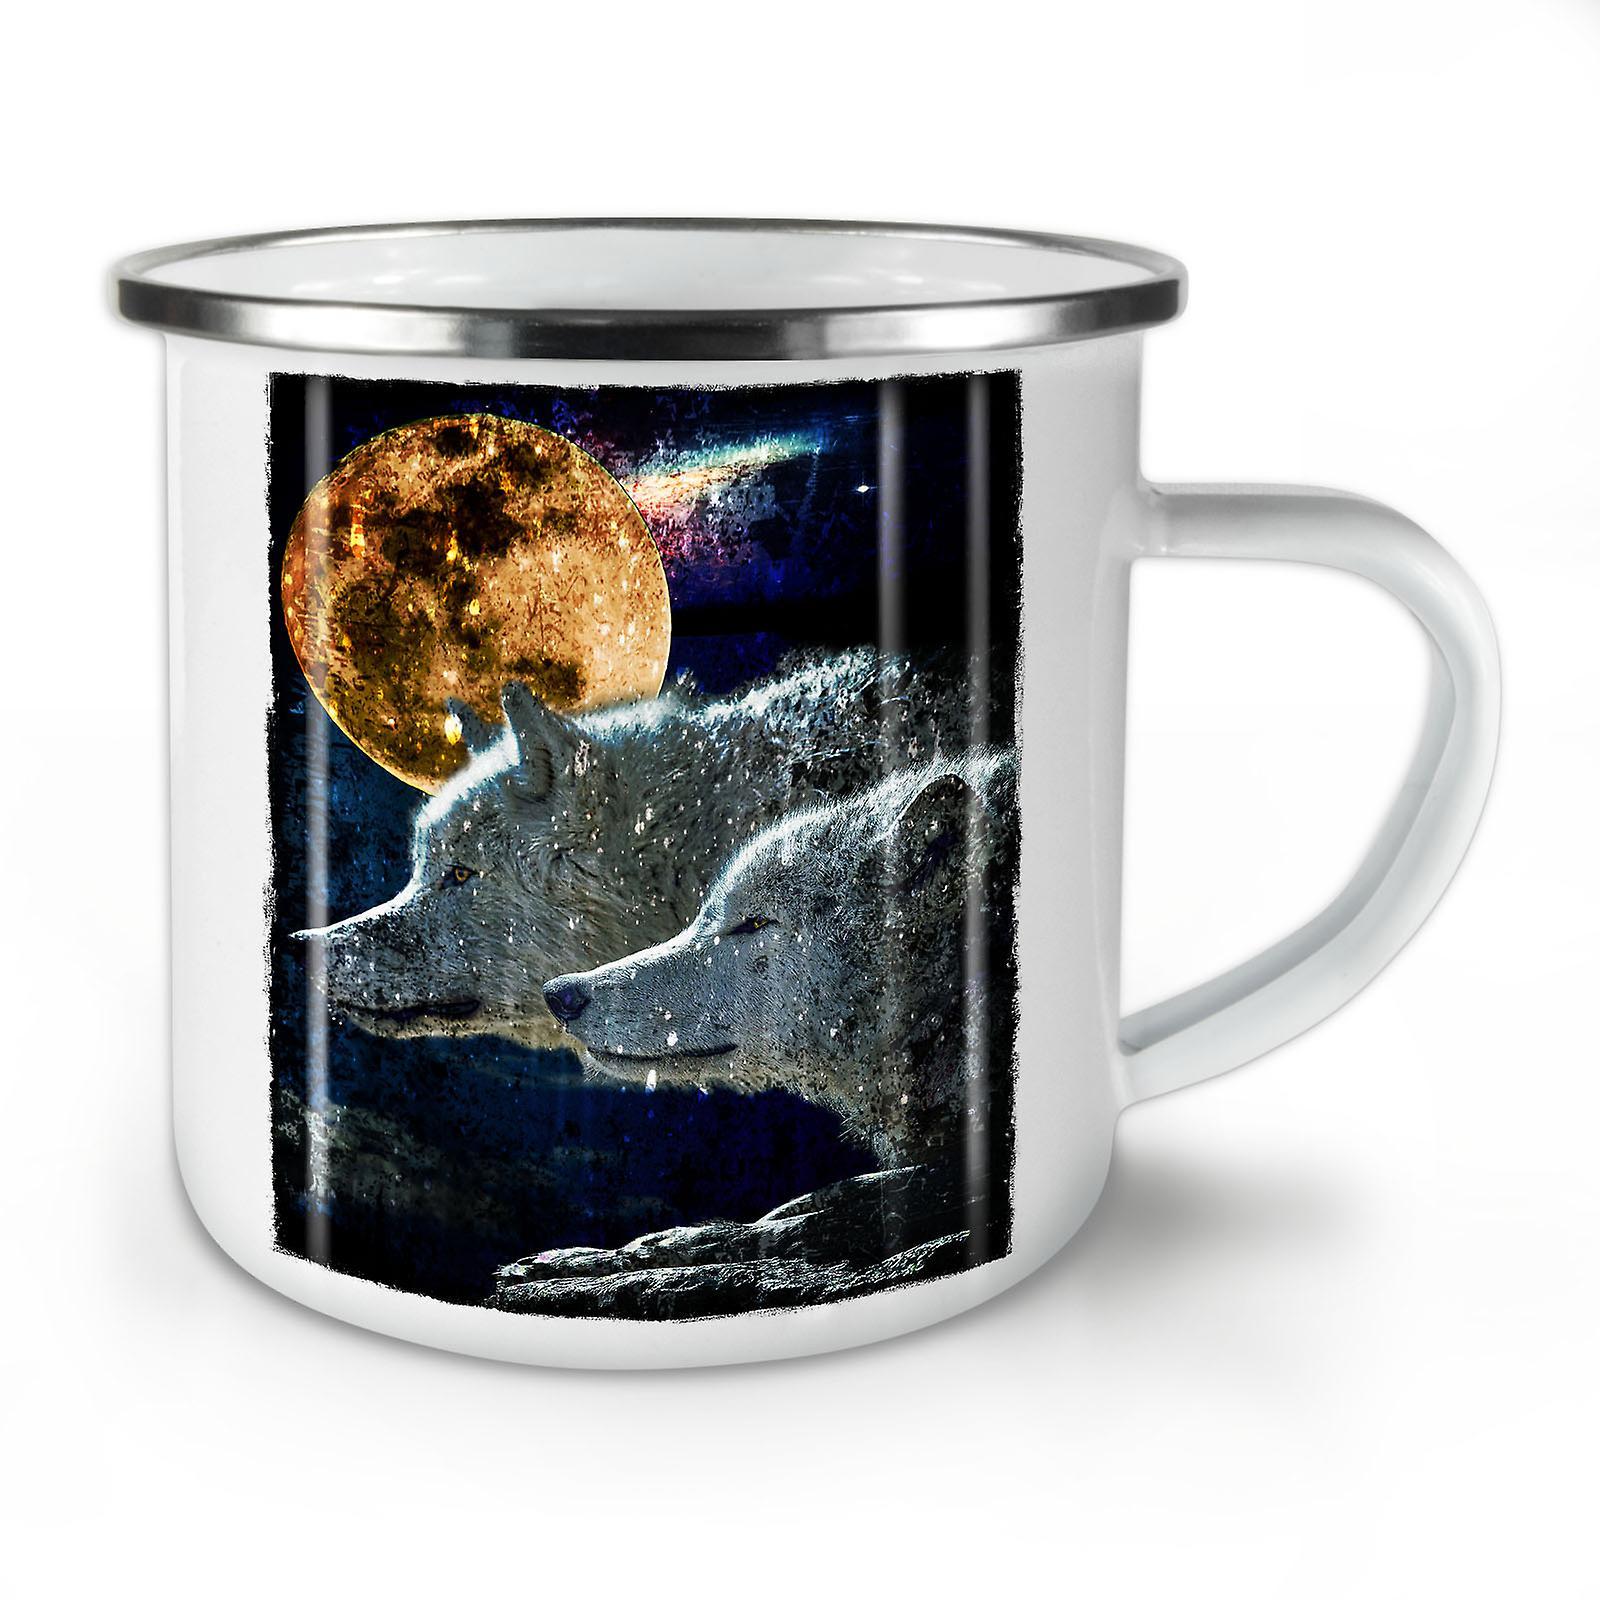 Moon Nouveau OzWellcoda Wolf Café Couple De Animal Mug10 Whitetea Émail b7gYf6yv